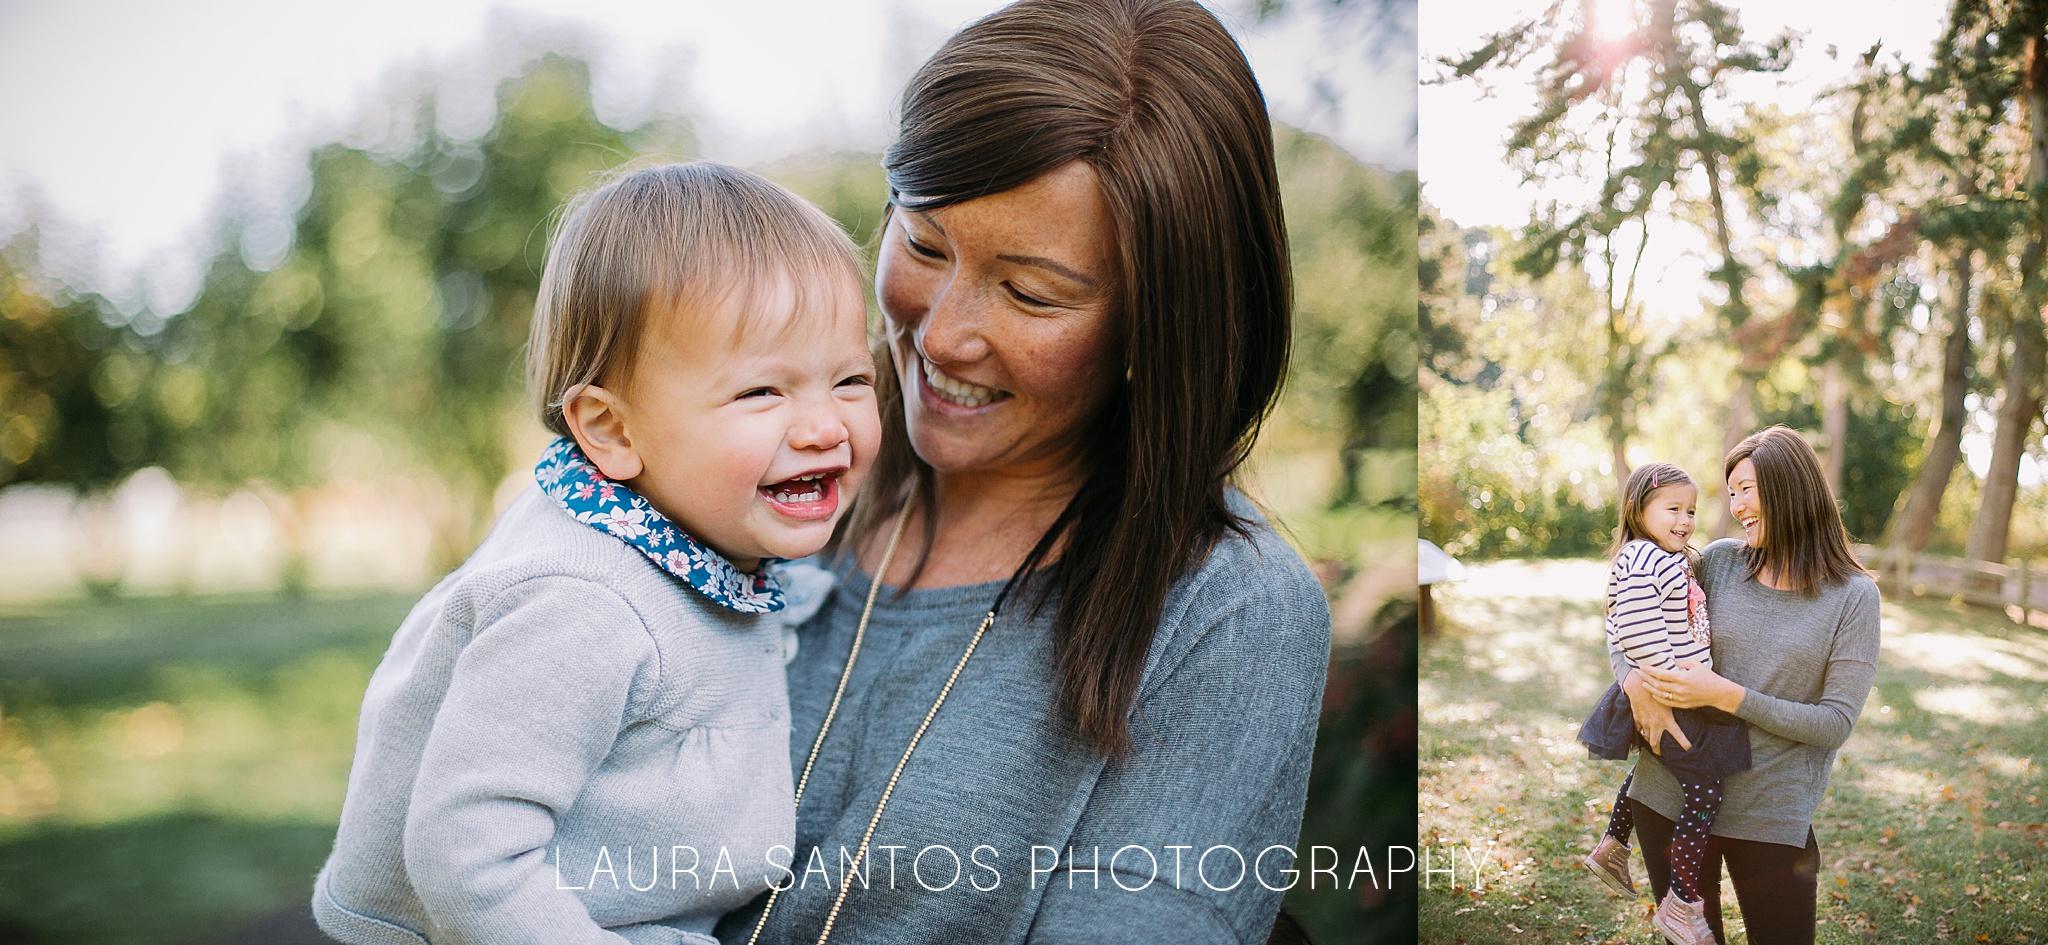 Laura Santos Photography Portland Oregon Family Photographer_0540.jpg